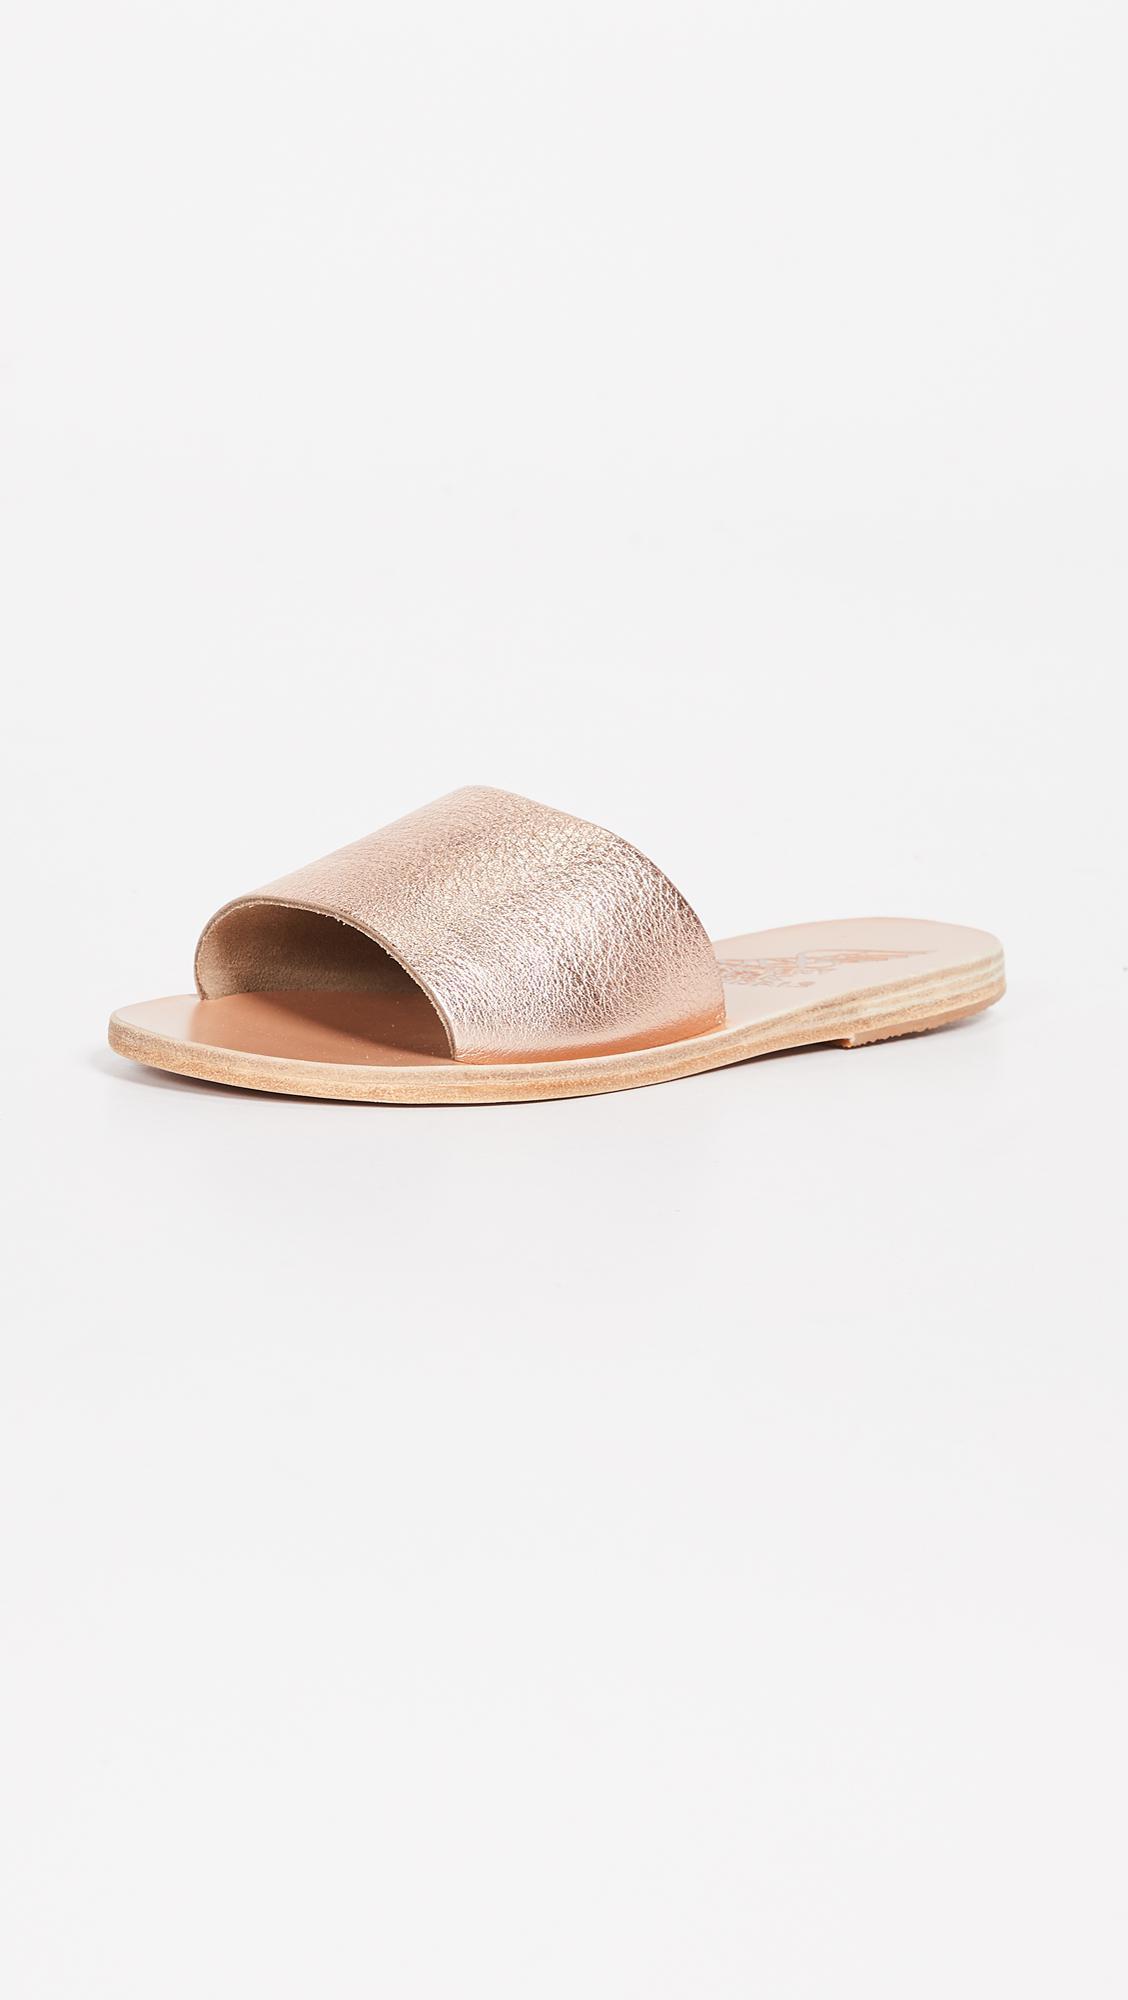 Womens Taygete Eros Leather Slide Sandals Ancient Greek Sandals Hyper Online SPC7Jsy